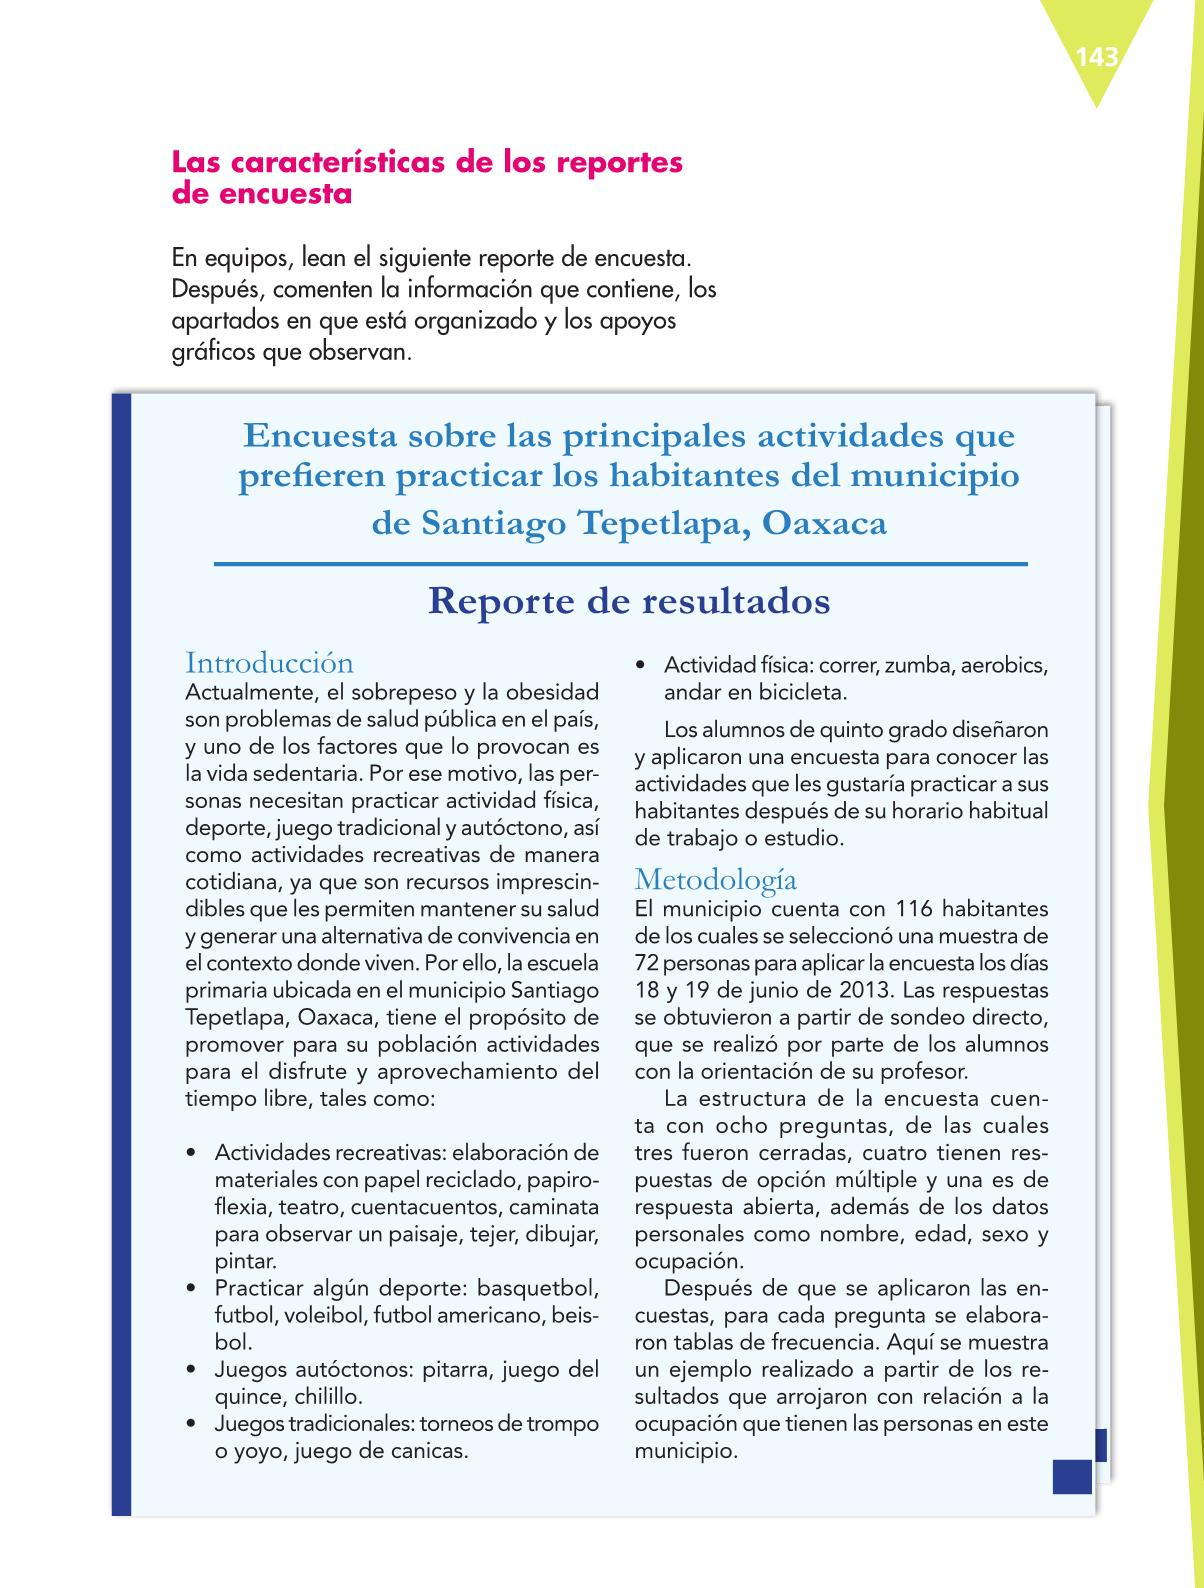 Español Libro para el alumnoquintoPagina 143